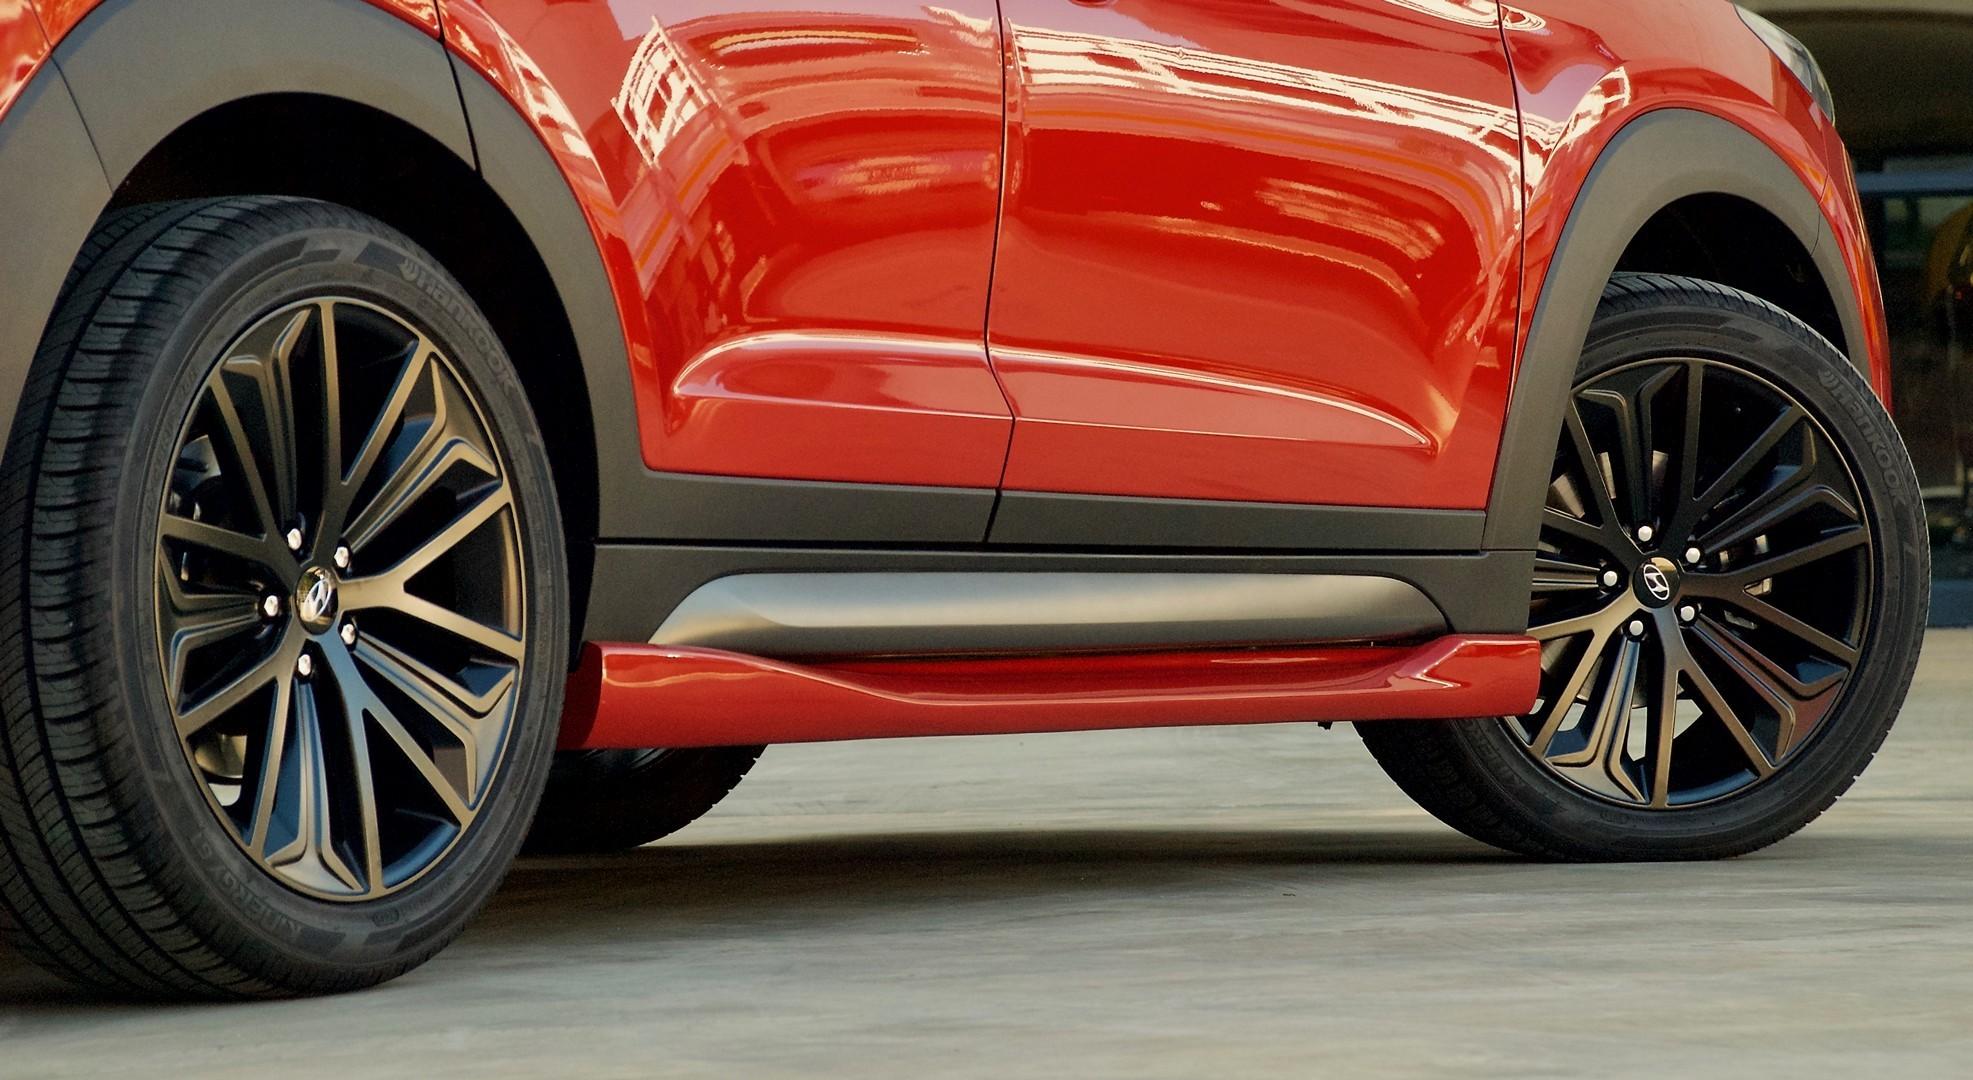 Hyundai Tucson Sport Has Body Kit Quad Pipes And 204 Hp 1